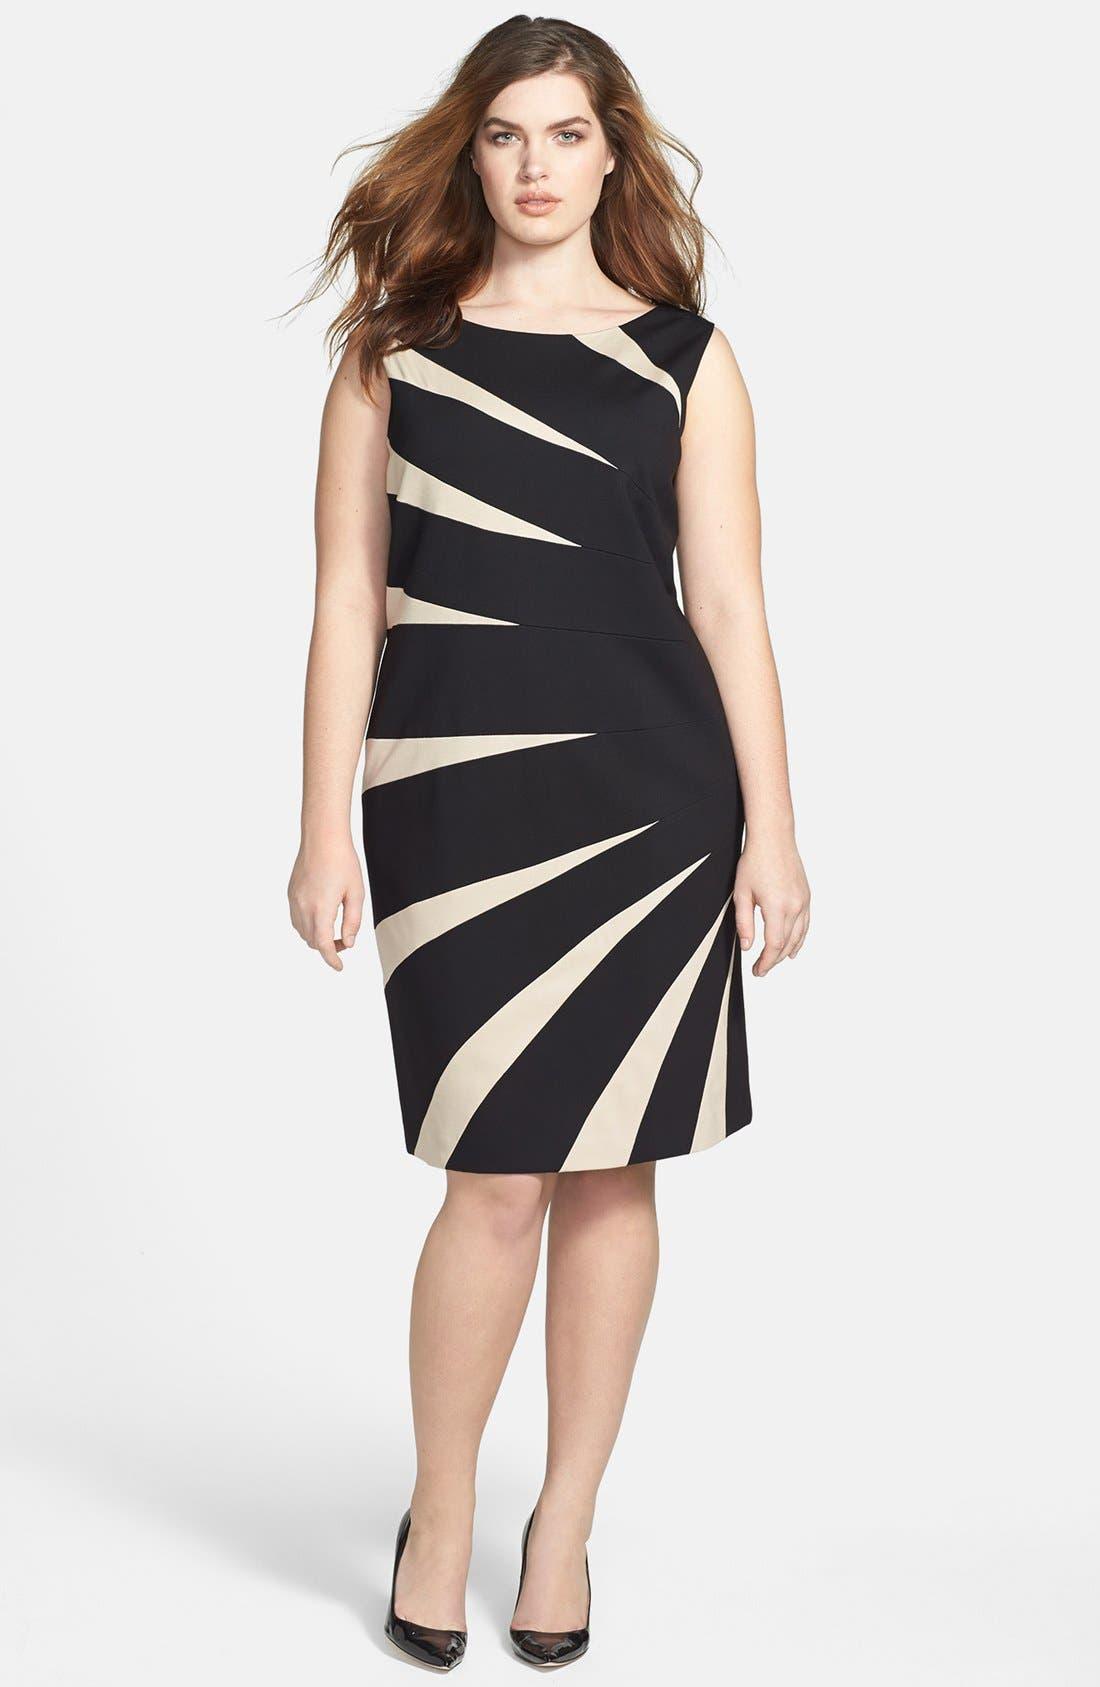 Alternate Image 1 Selected - Tahari Starburst Ponte Sheath Dress (Plus Size)